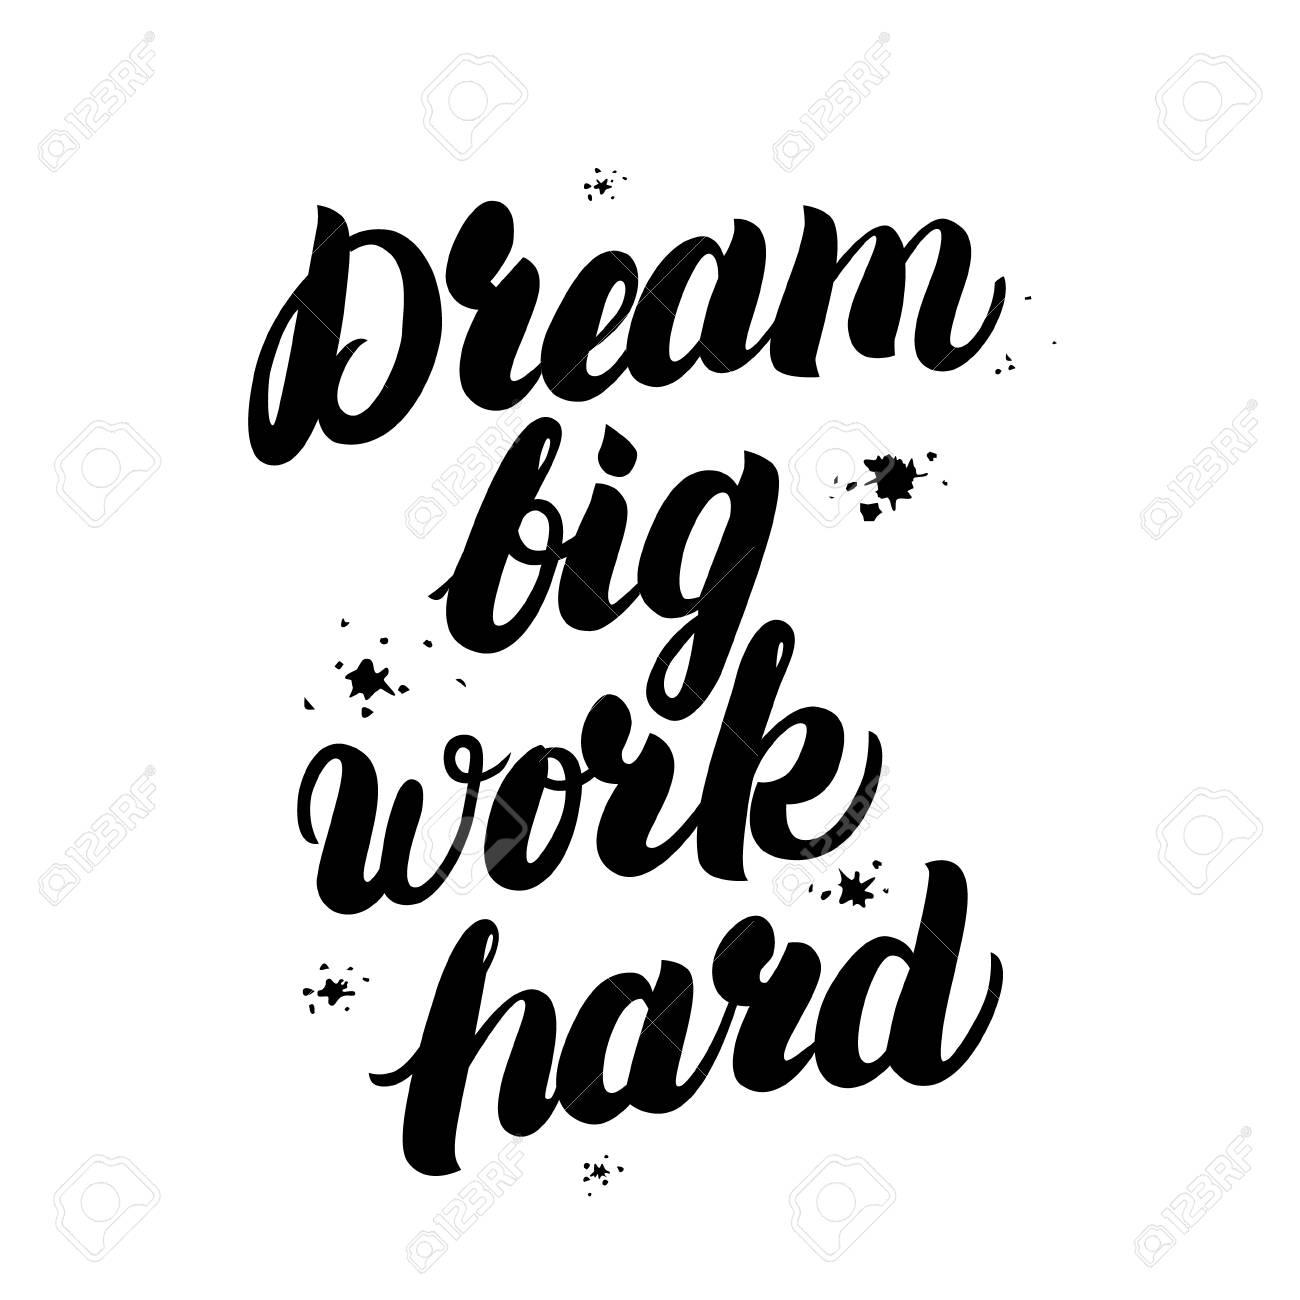 Fond D Écran Motivation dream big work hard motivation inspirant citations avec un fond d